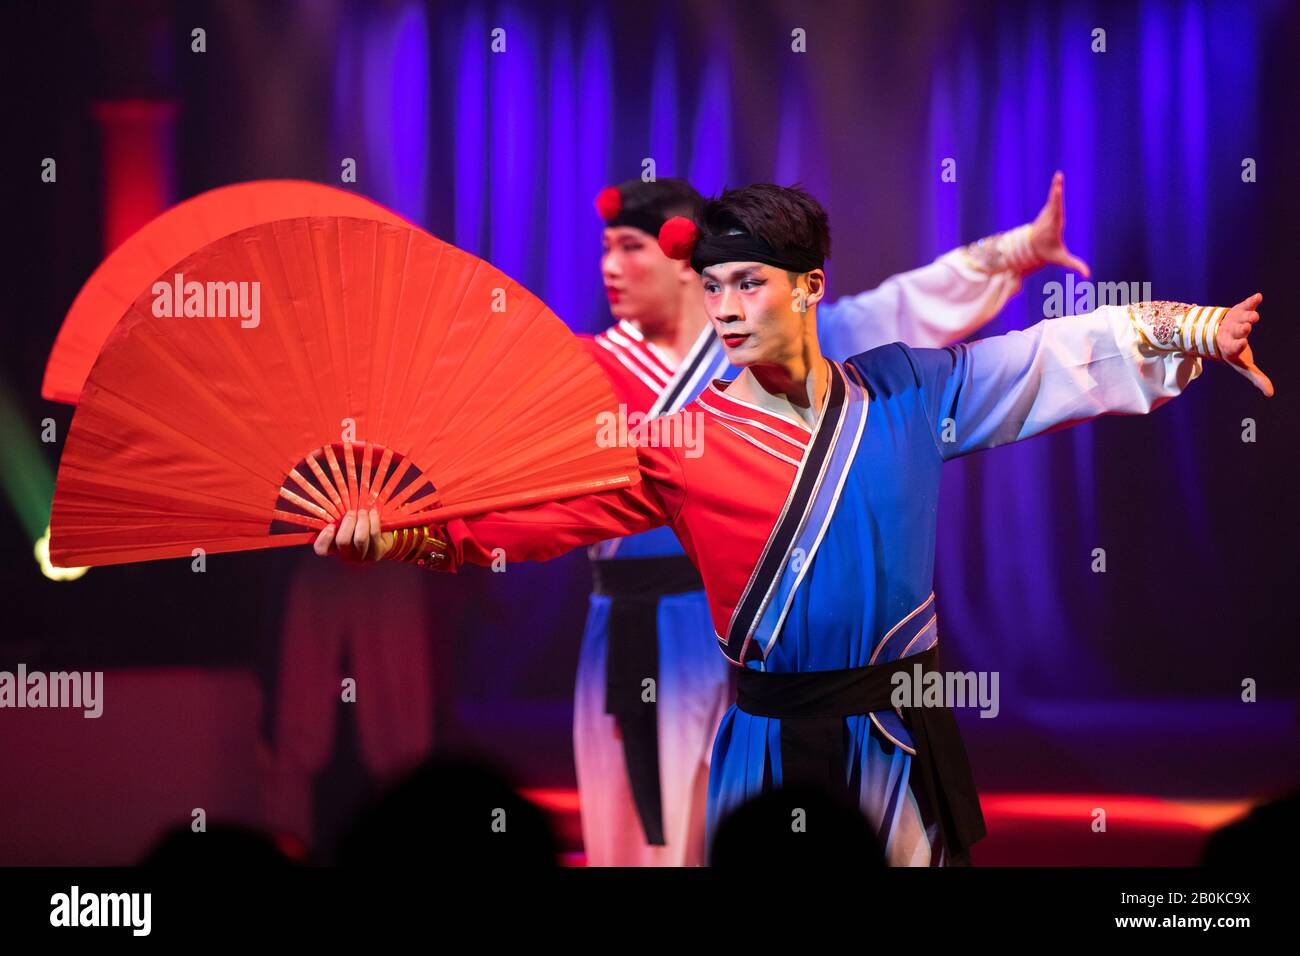 GIRONA, SPAIN - FEBRUARY 18: Anhui Acrobatic Troupe of China perform during 'Elefant d'Or' International Circus Festival at Parc de la Devesa on Febru Stock Photo